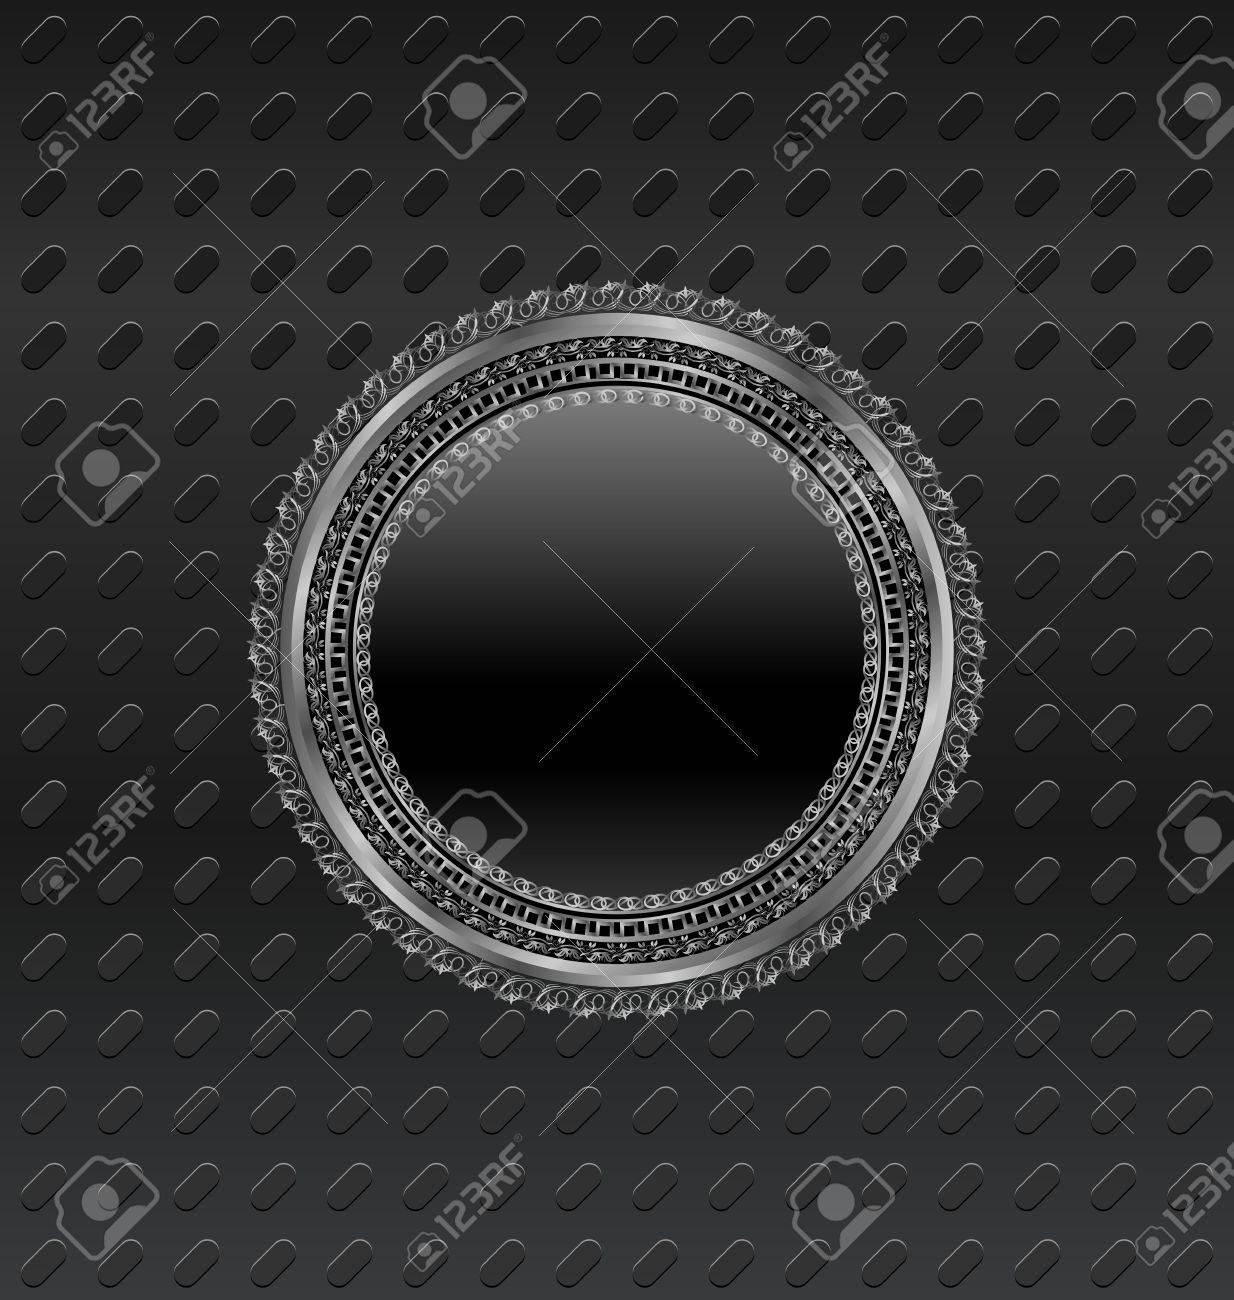 Illustration heraldic circle shield on titanium background - vector Stock Vector - 24332194